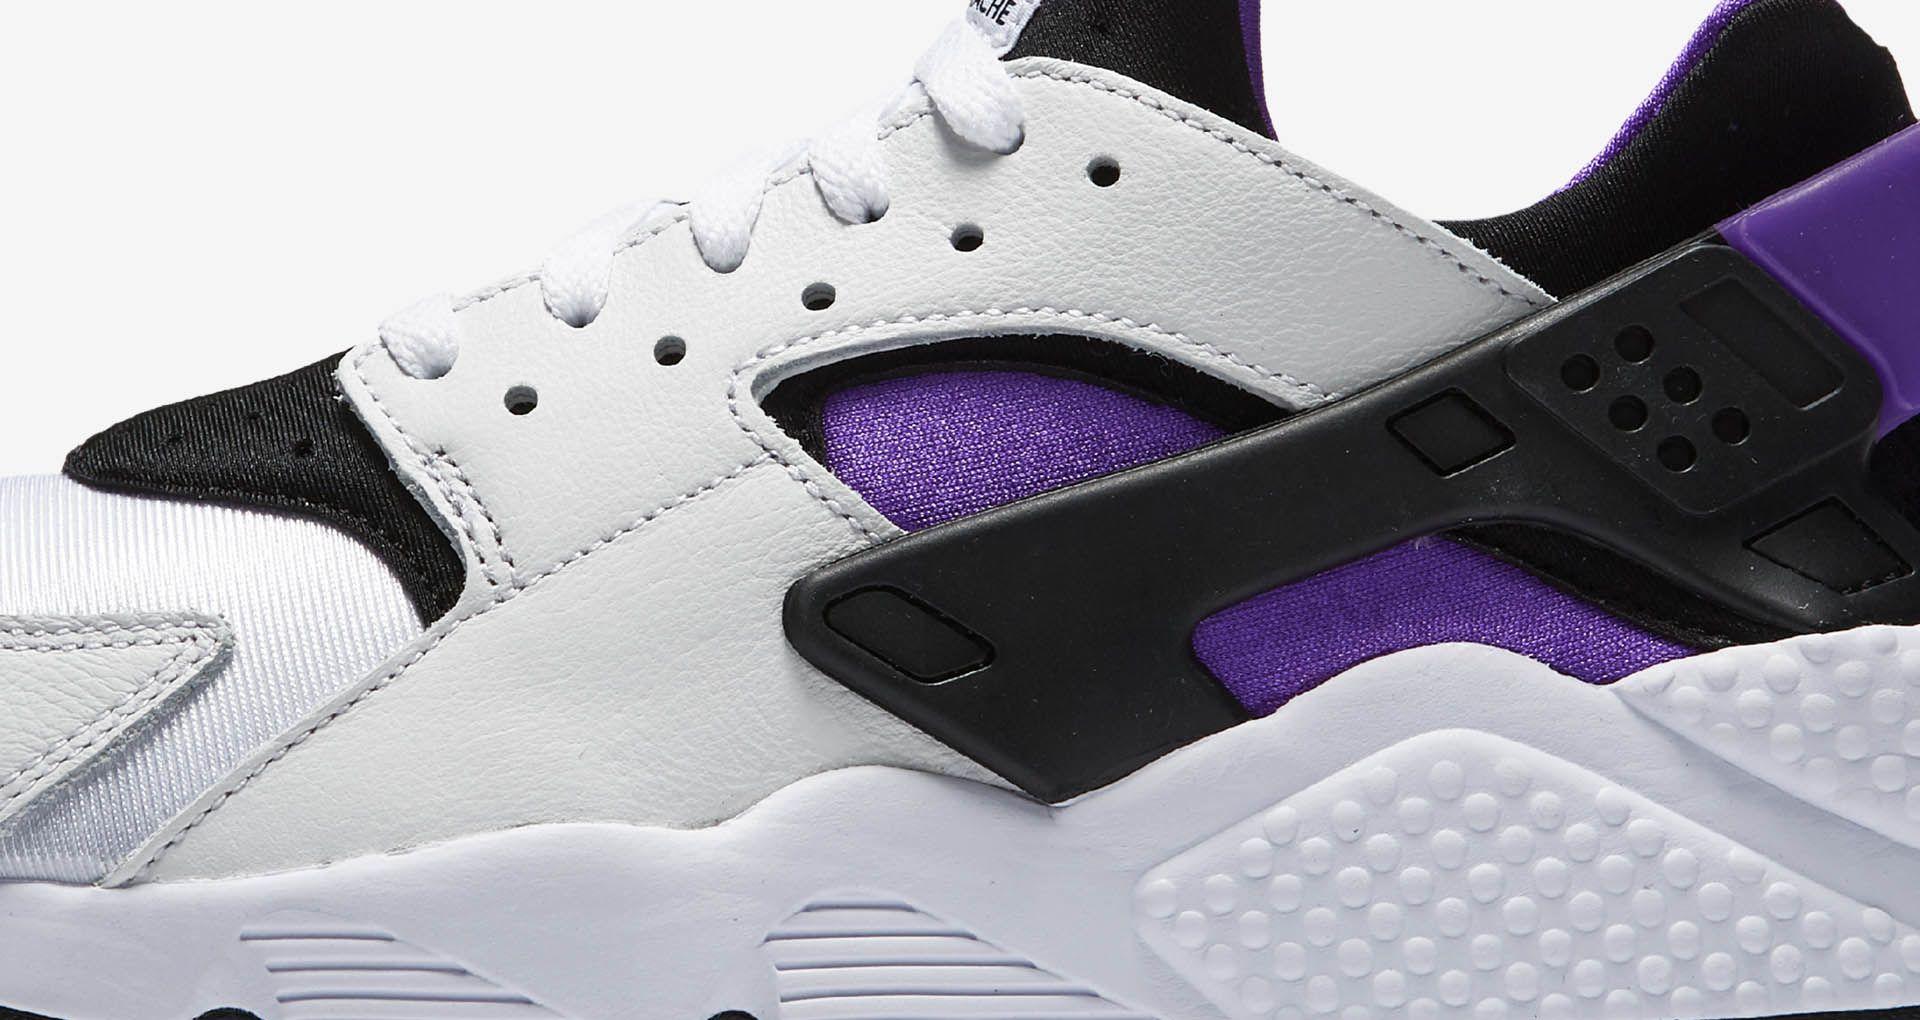 buy online 0de90 ff7a8 Nike Air Huarache Run '91 'White & Purple Punch' Release ...